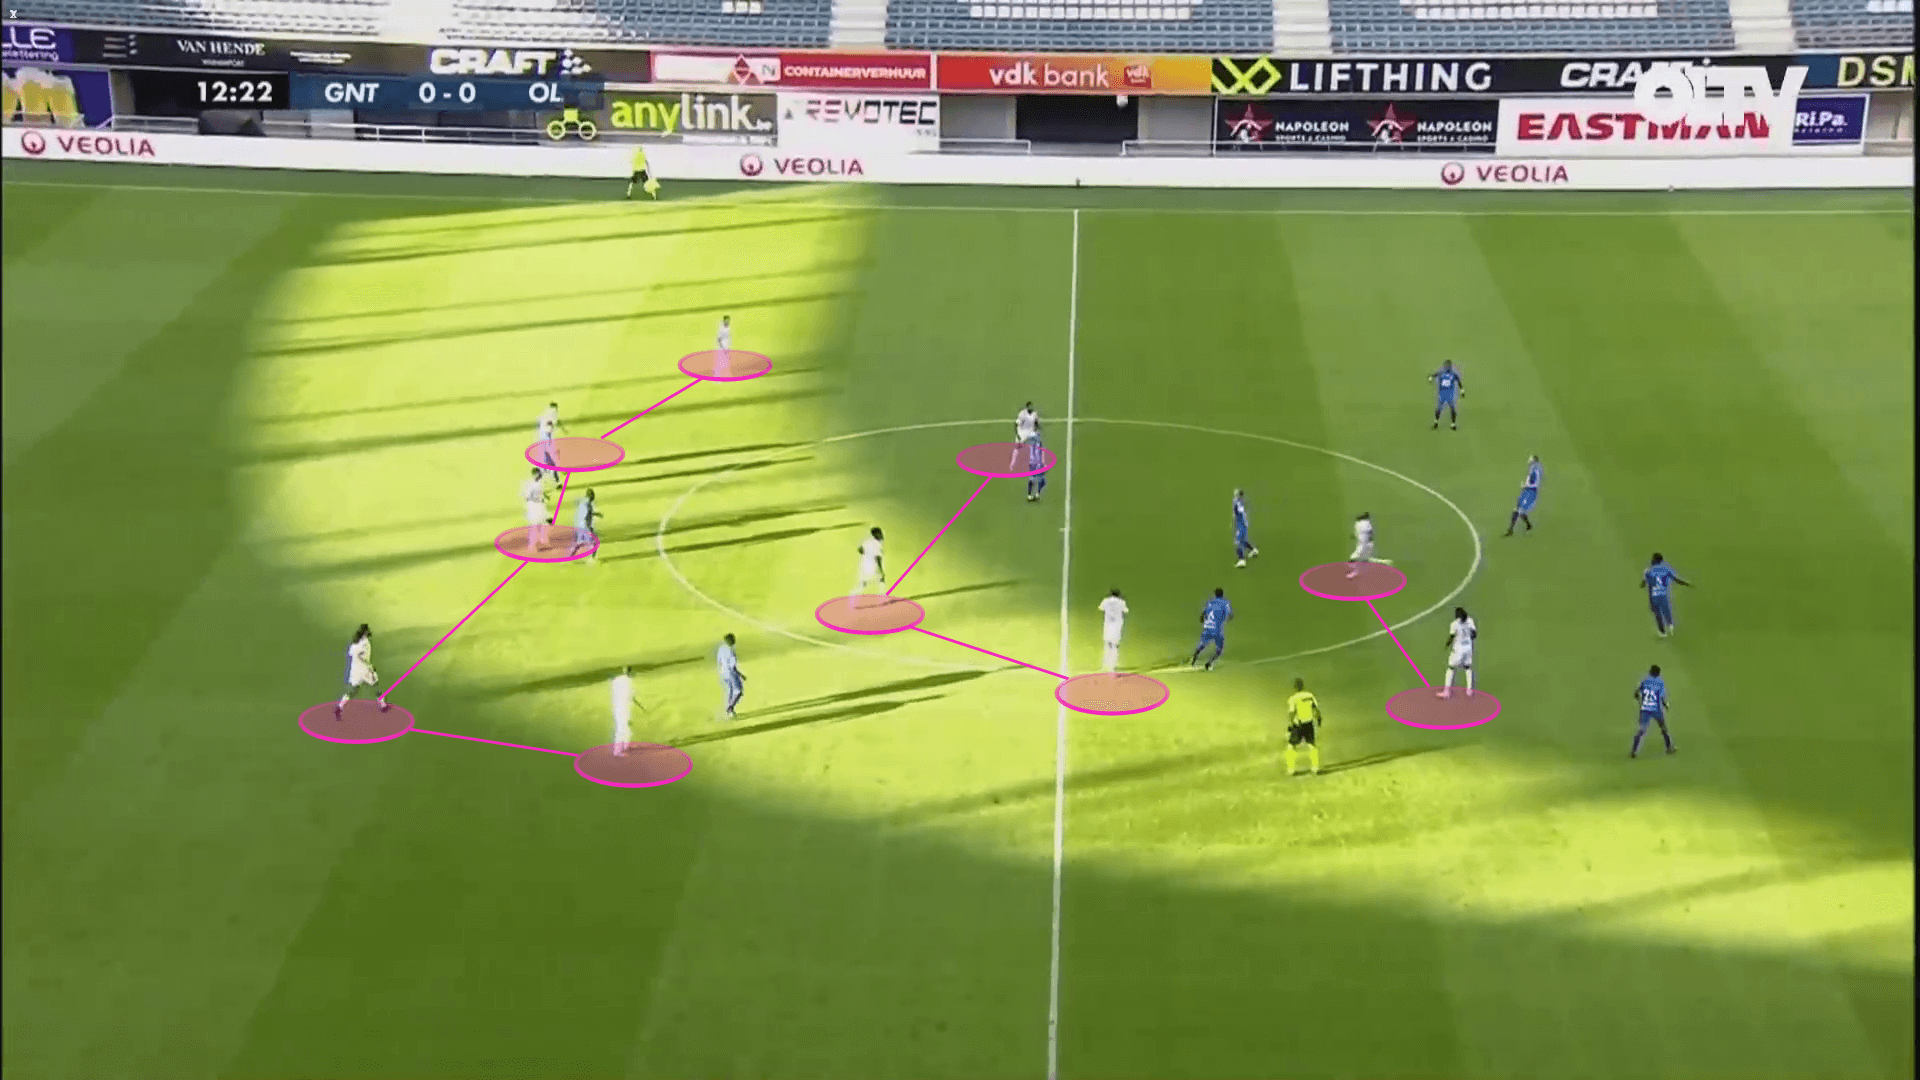 UEFA Champions League 2019/20: Juventus vs Lyon – tactical preview tactics